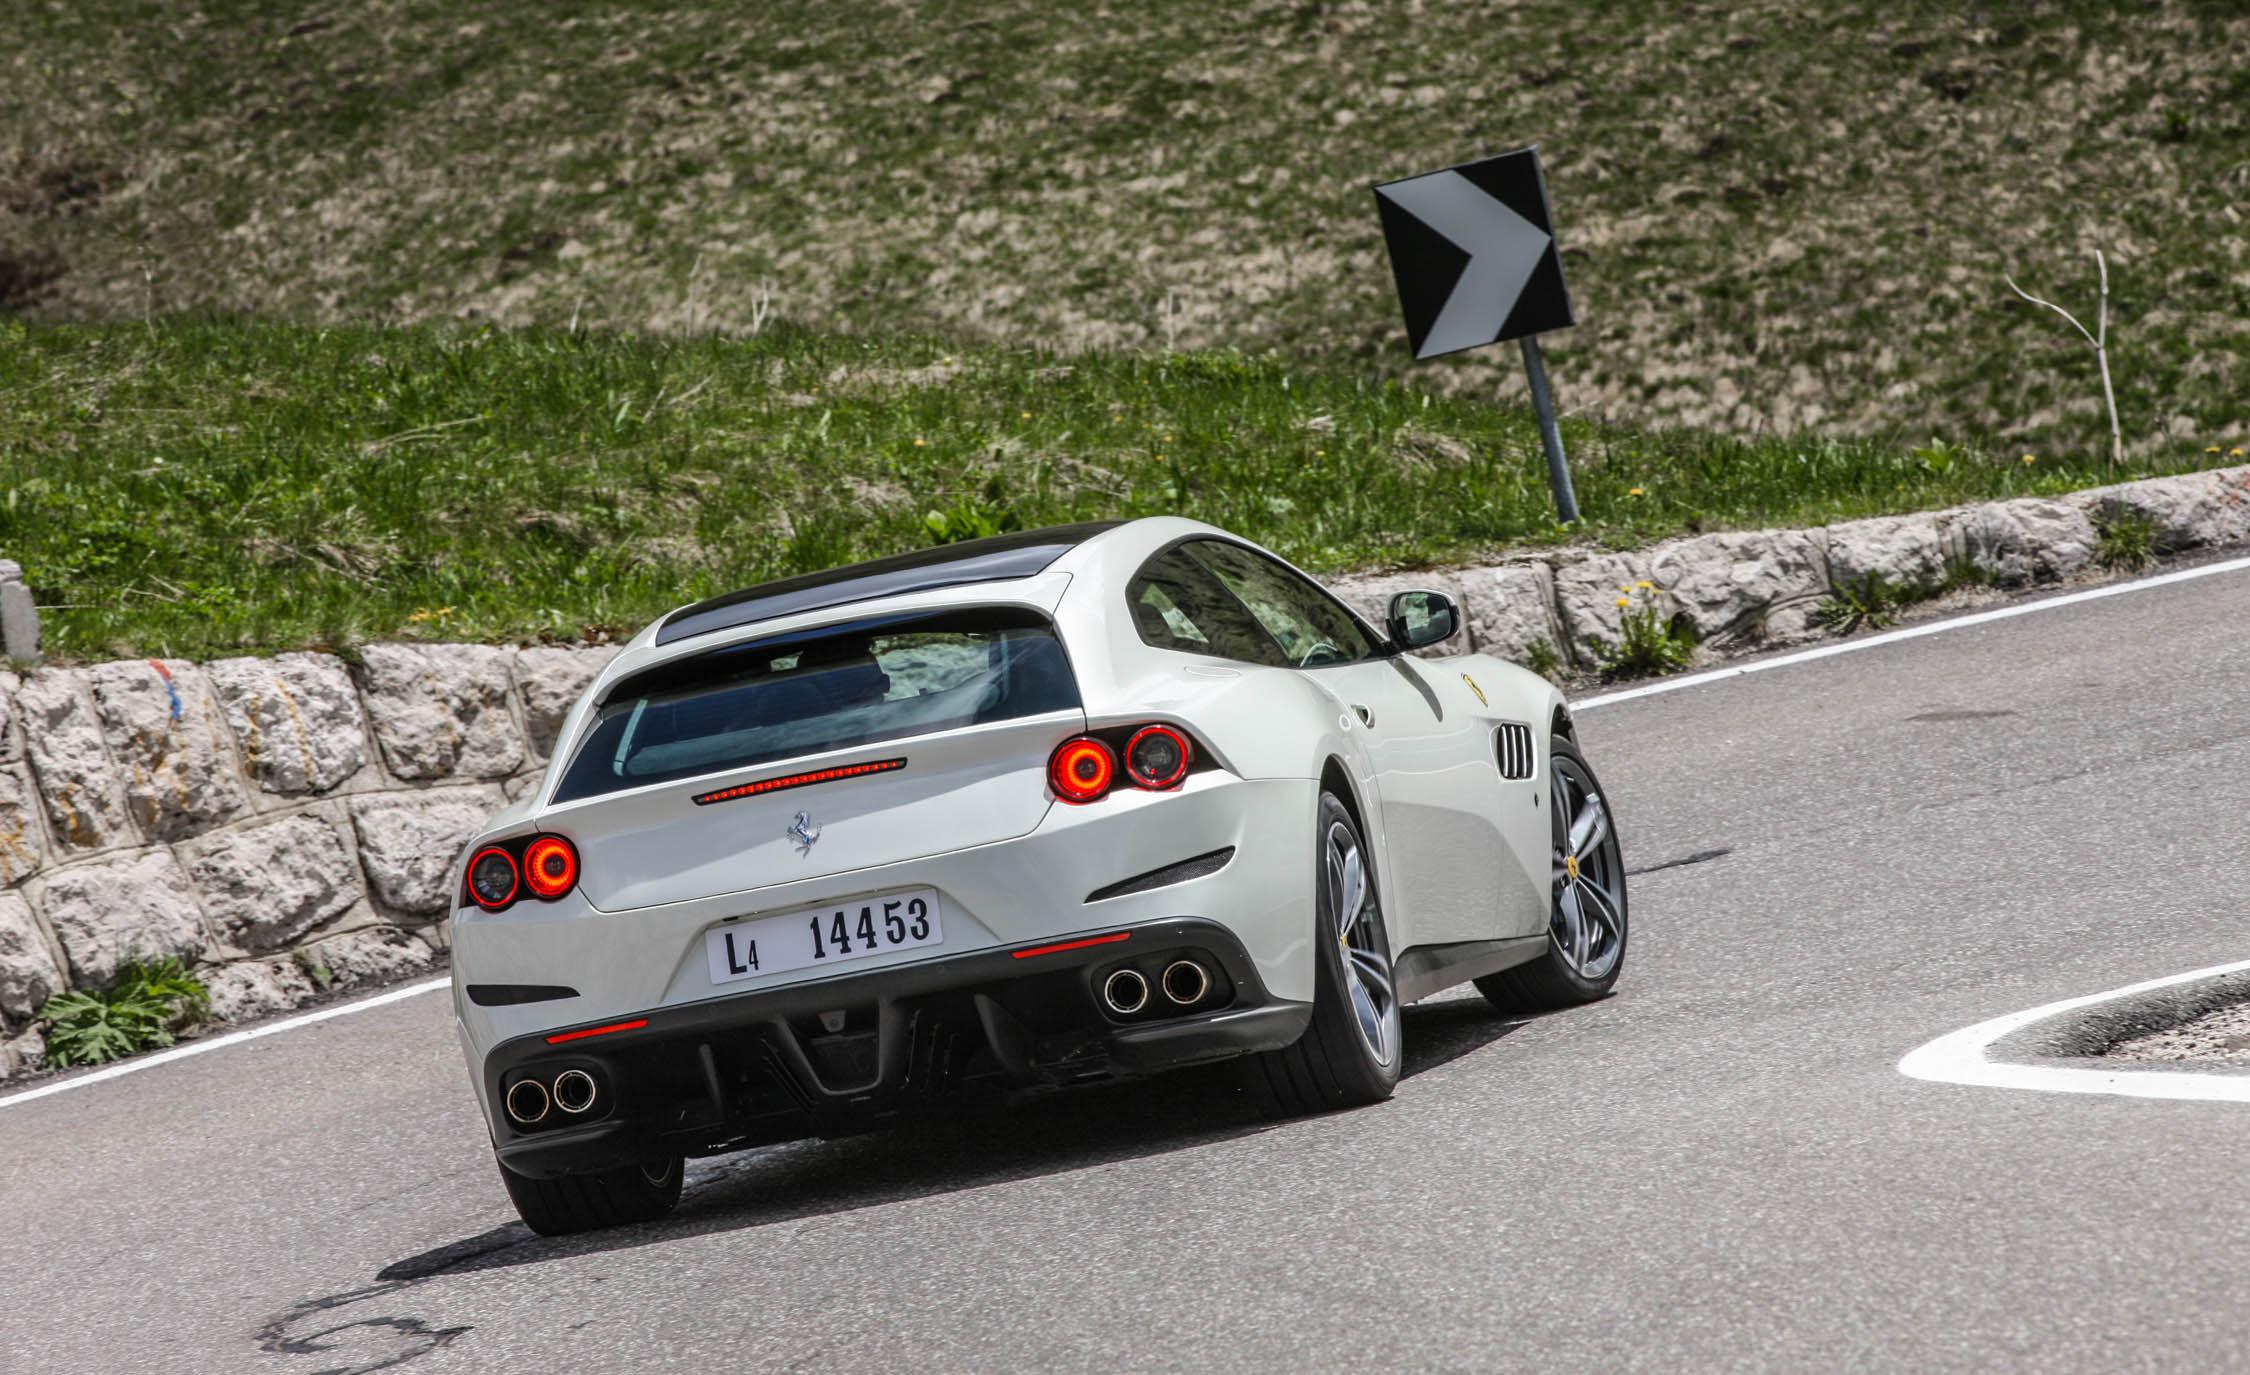 2017 Ferrari GTC4Lusso (View 20 of 52)